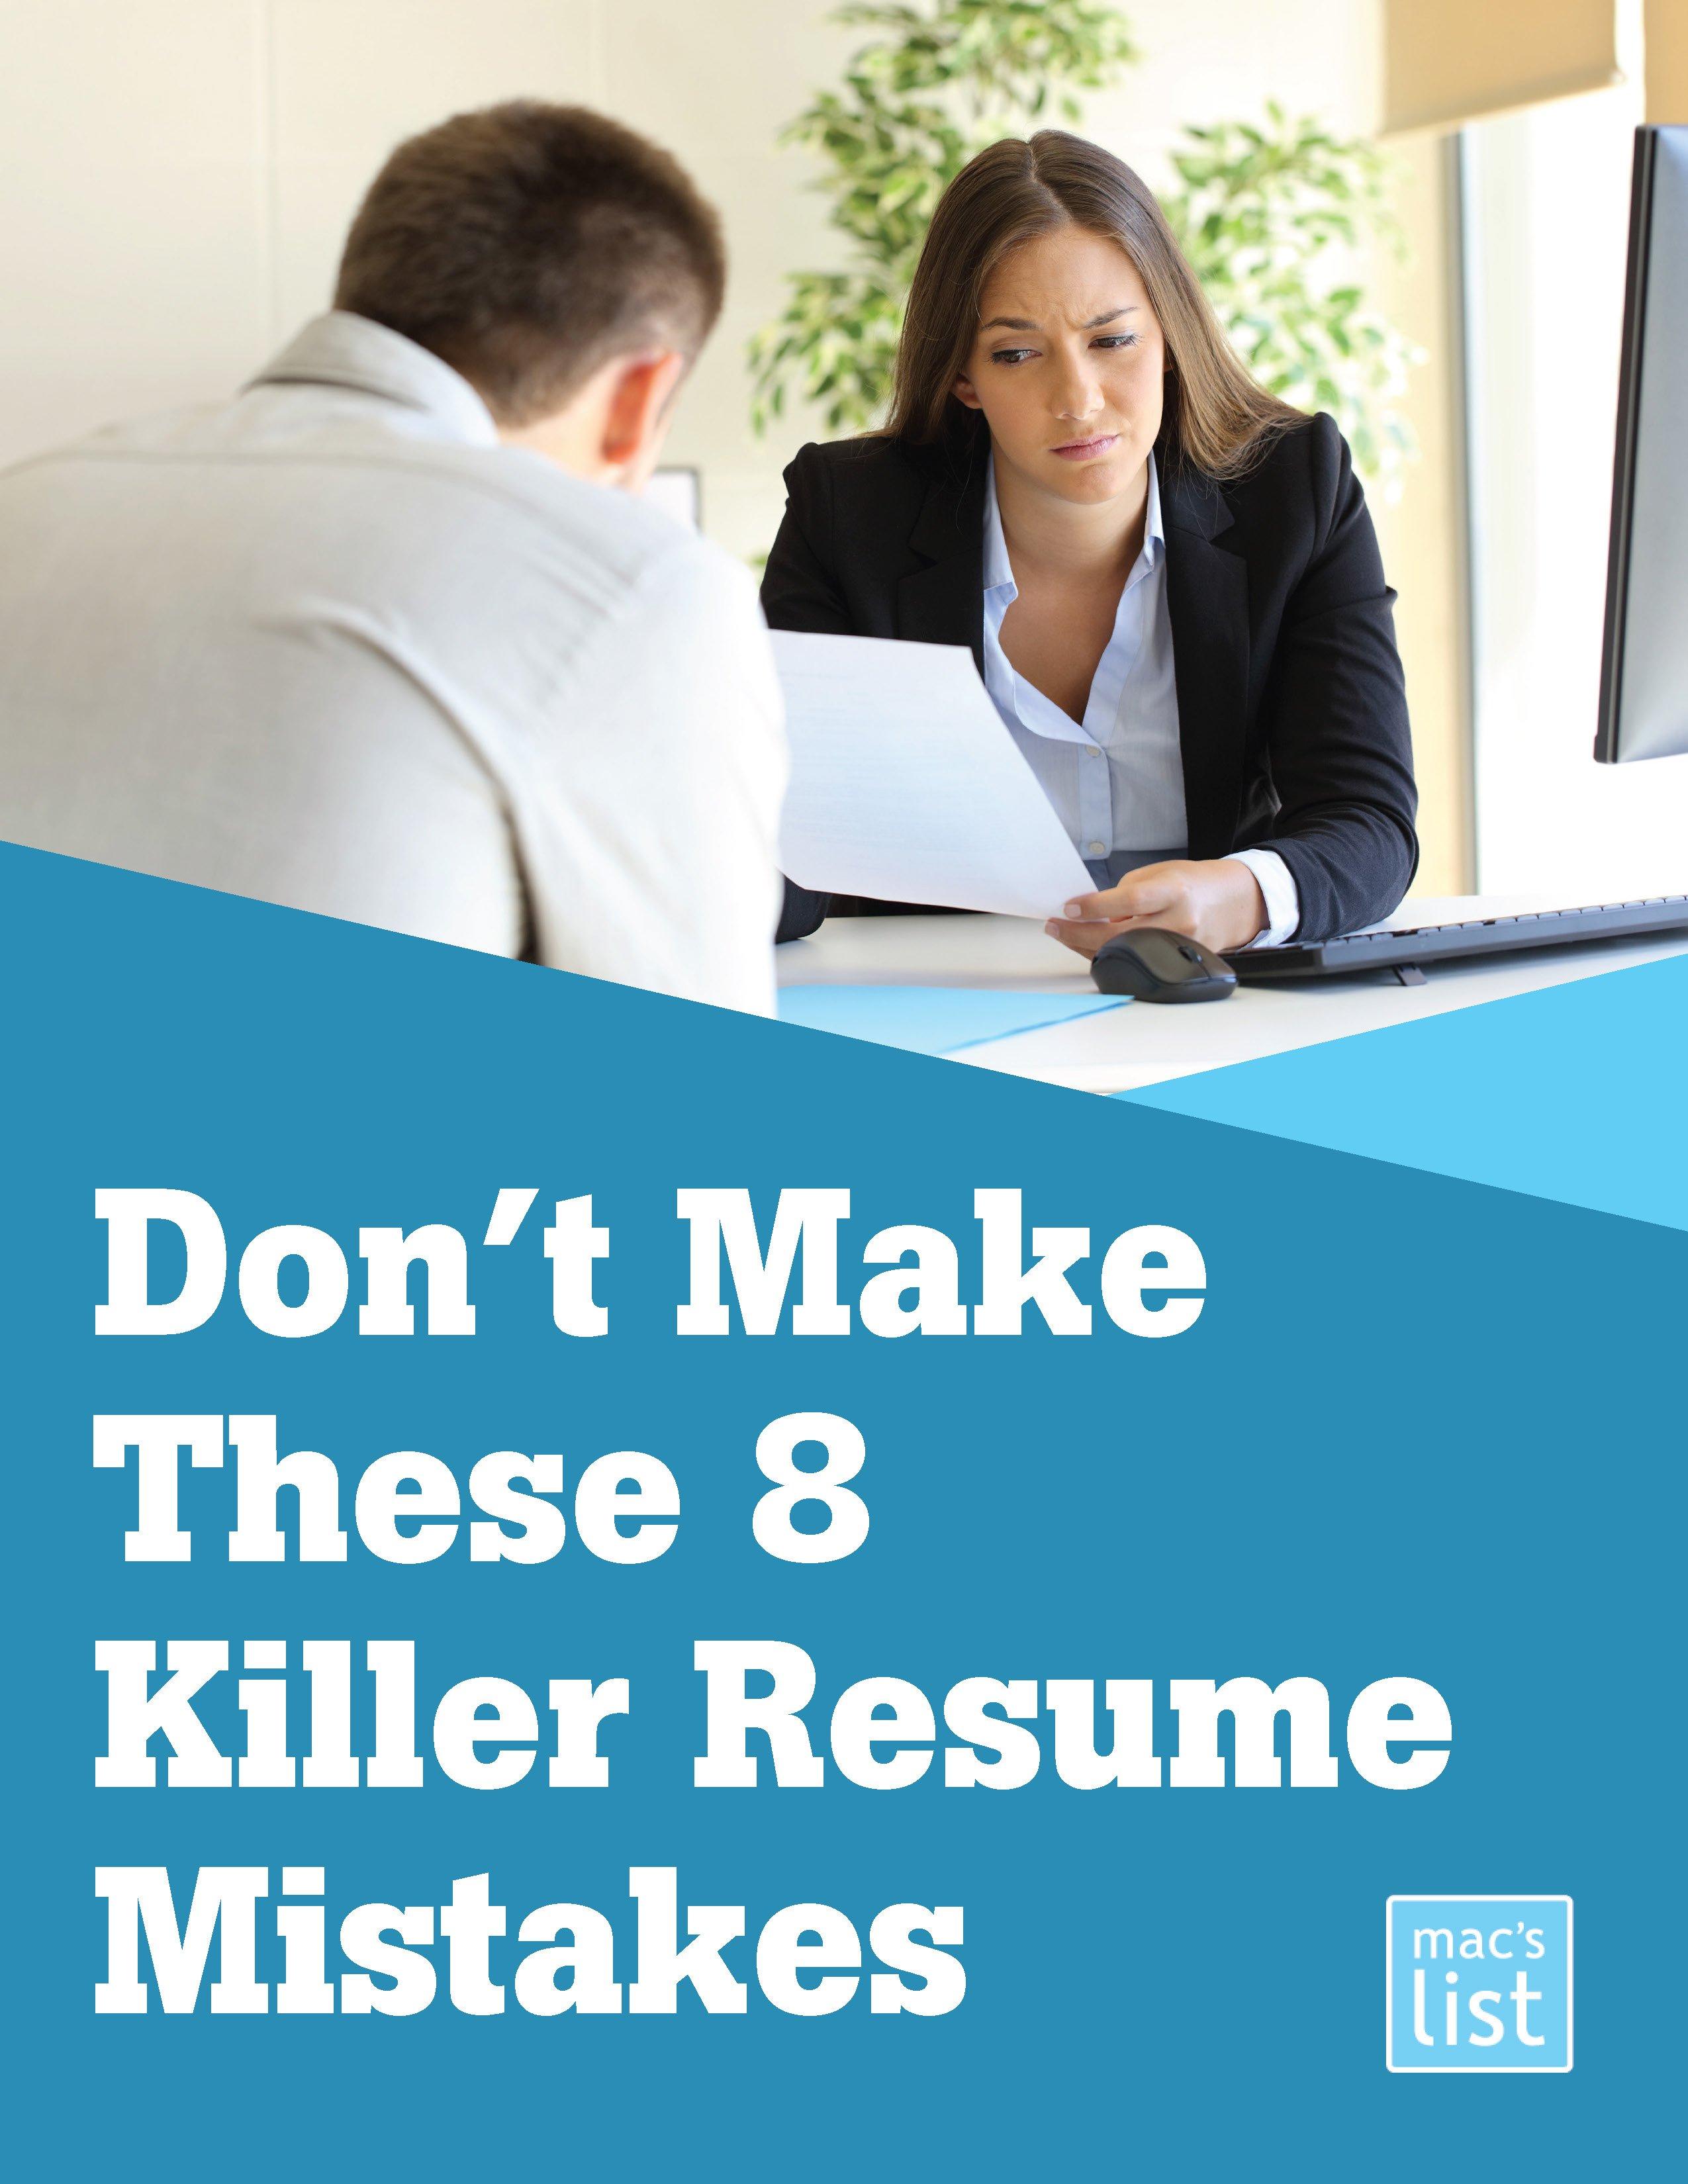 don't make these 8 killer resume mistakes